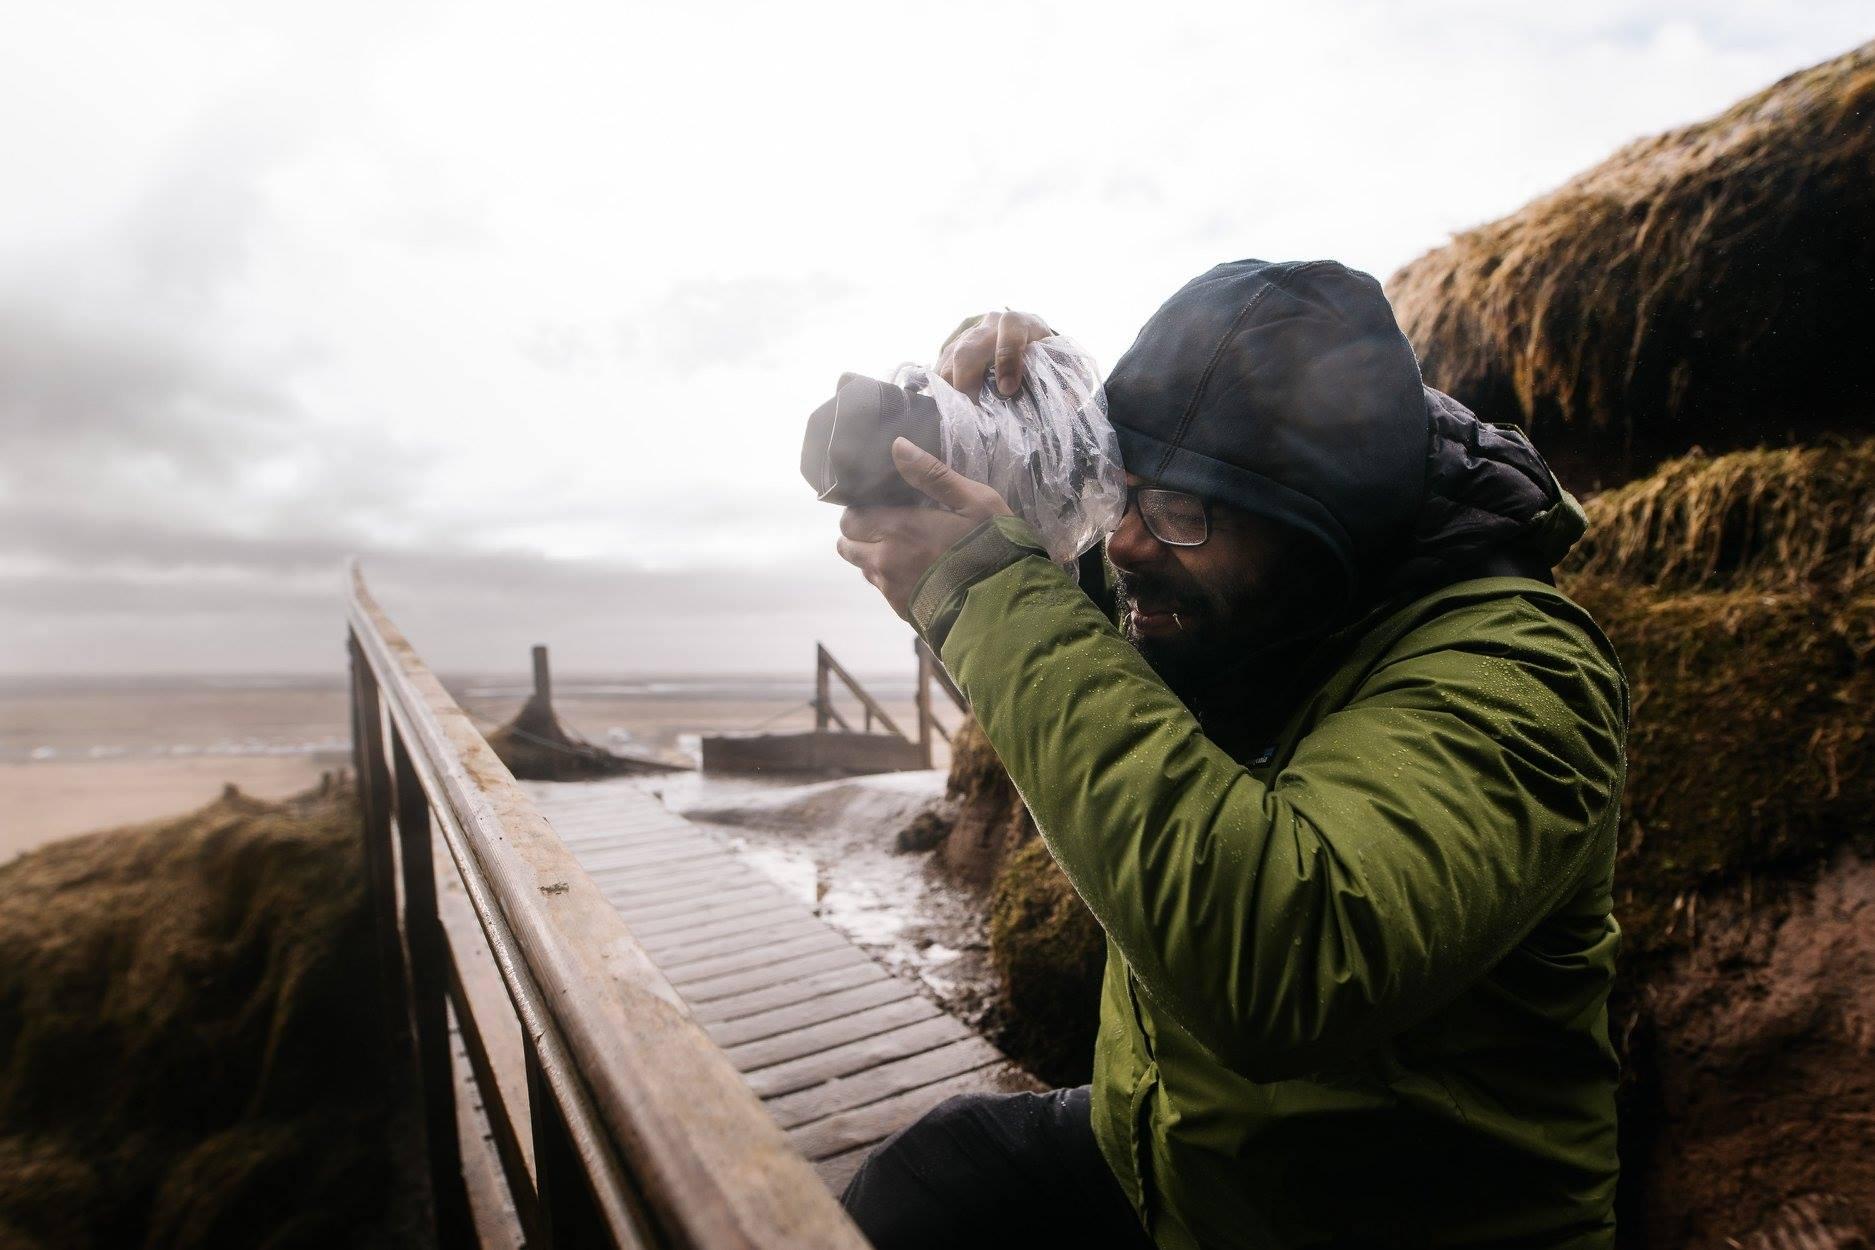 fotografie avontuur IJsland Chris Konig foto (5)